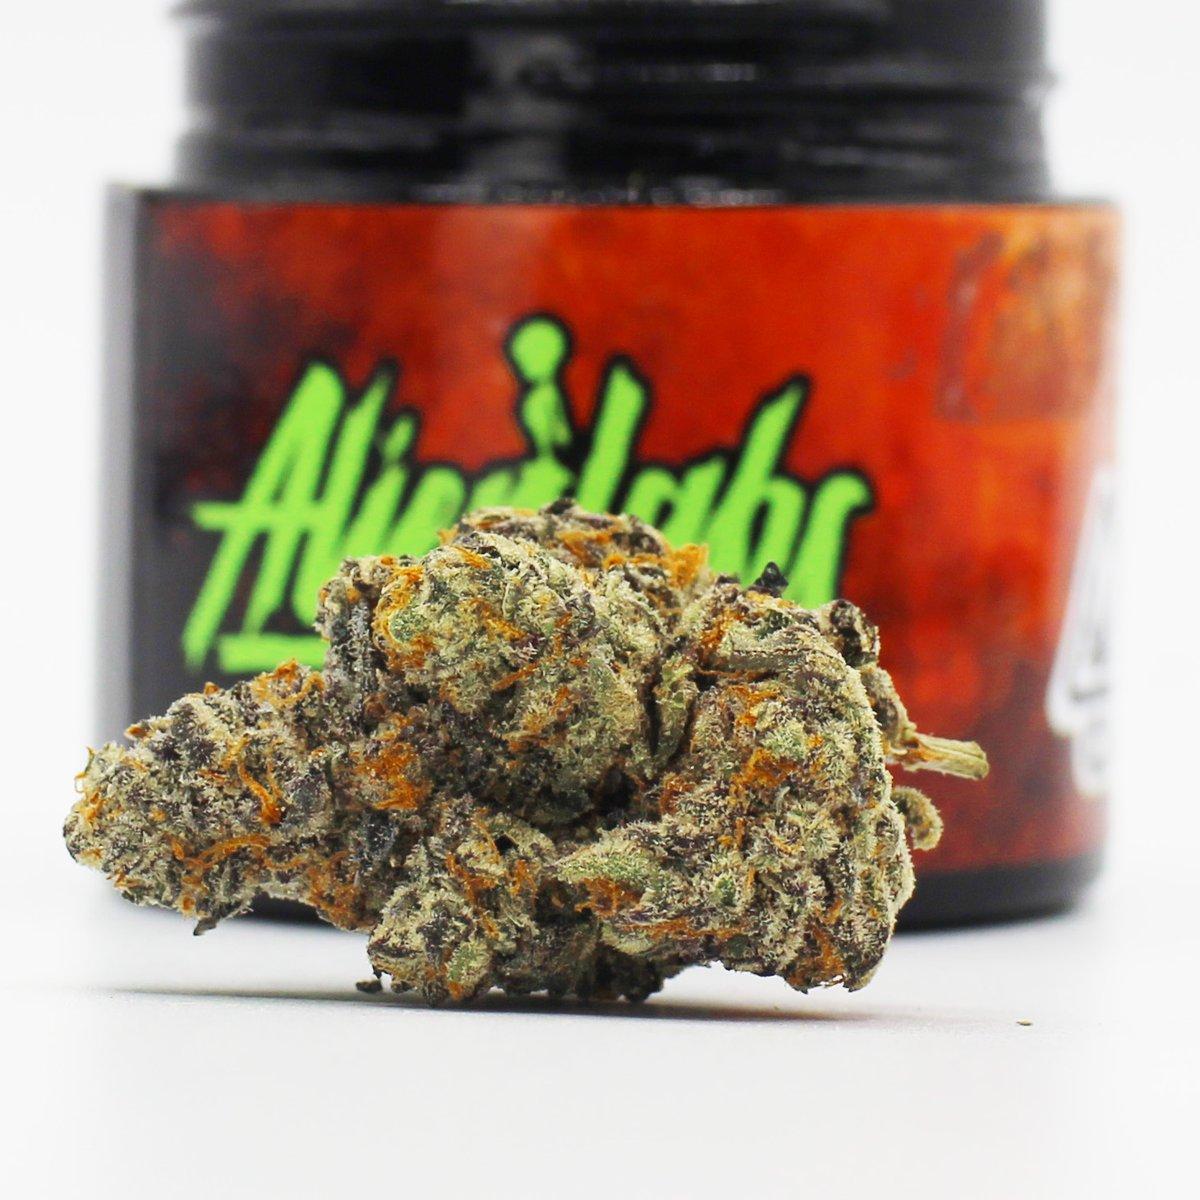 Alien_Labs_Sherbacio_LA_Pottery_cannabis_Delivery_1200x1200.jpg